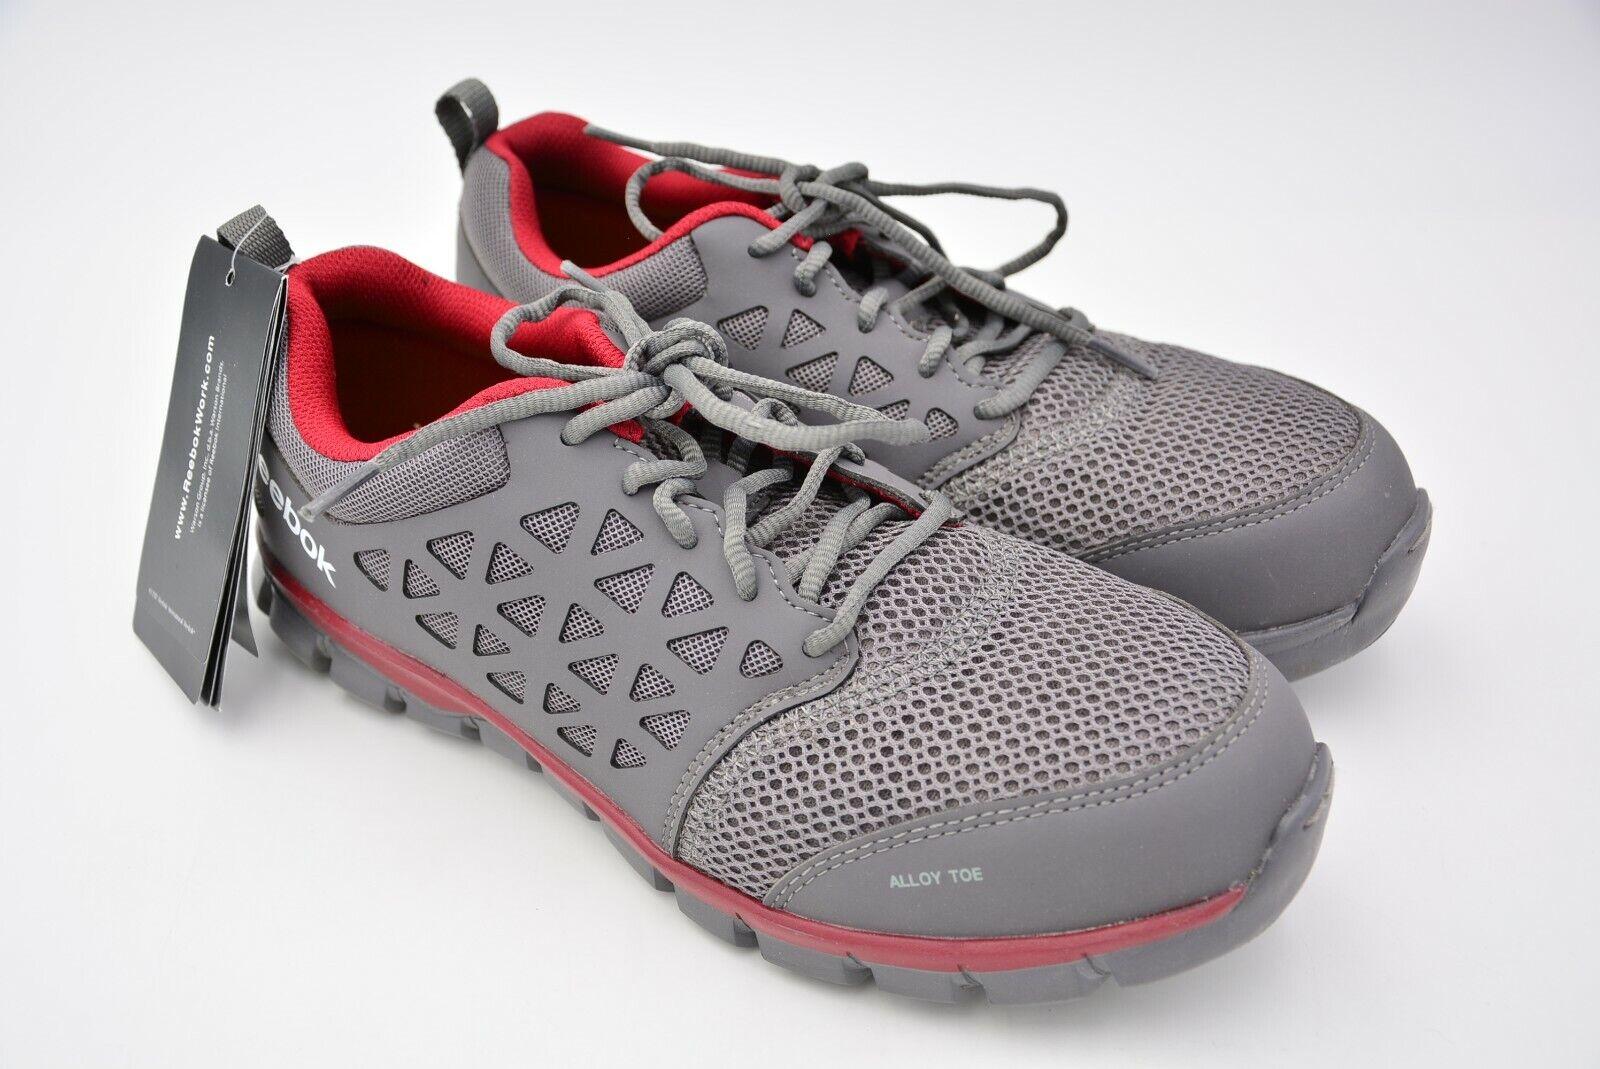 Calzado Para Hombre Sublite Cojín constructio Reebok Rojo gris Sintético Usa